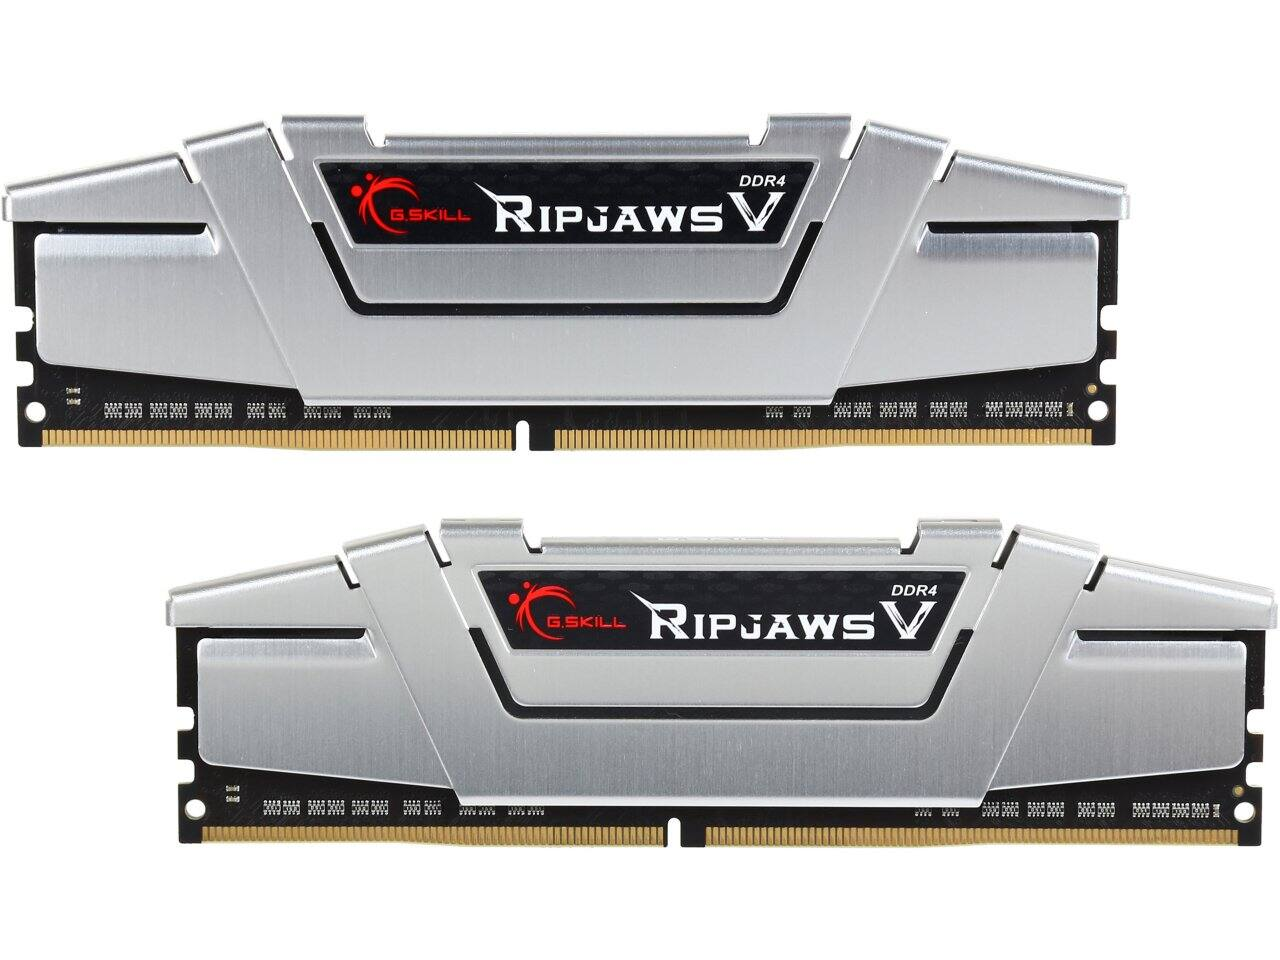 16 GB (2 x 8 GB) G.SKILL Ripjaws V Series DDR4 2400 Desktop Memory for $52.99, 16 GB Crucial Ballistix Sport LT DDR4 2400 Desktop Memory for $54.99 & More @ Newegg.com